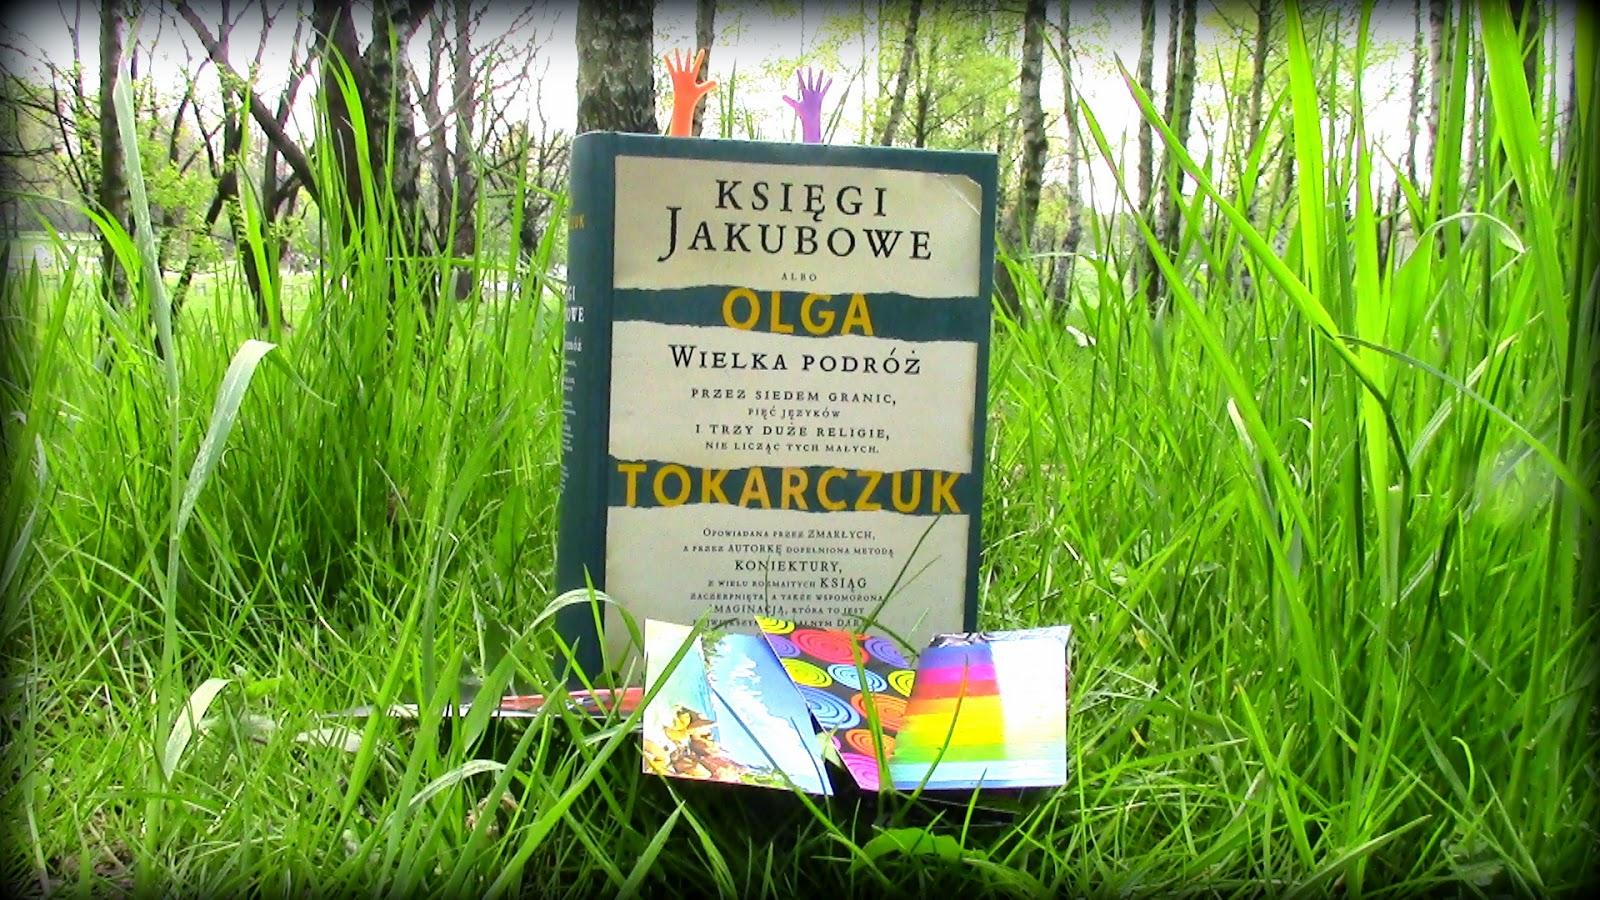 http://esaczyta.blogspot.com/2015/04/konkurs-ksiegi-jakubowe-olga-tokarczuk.html